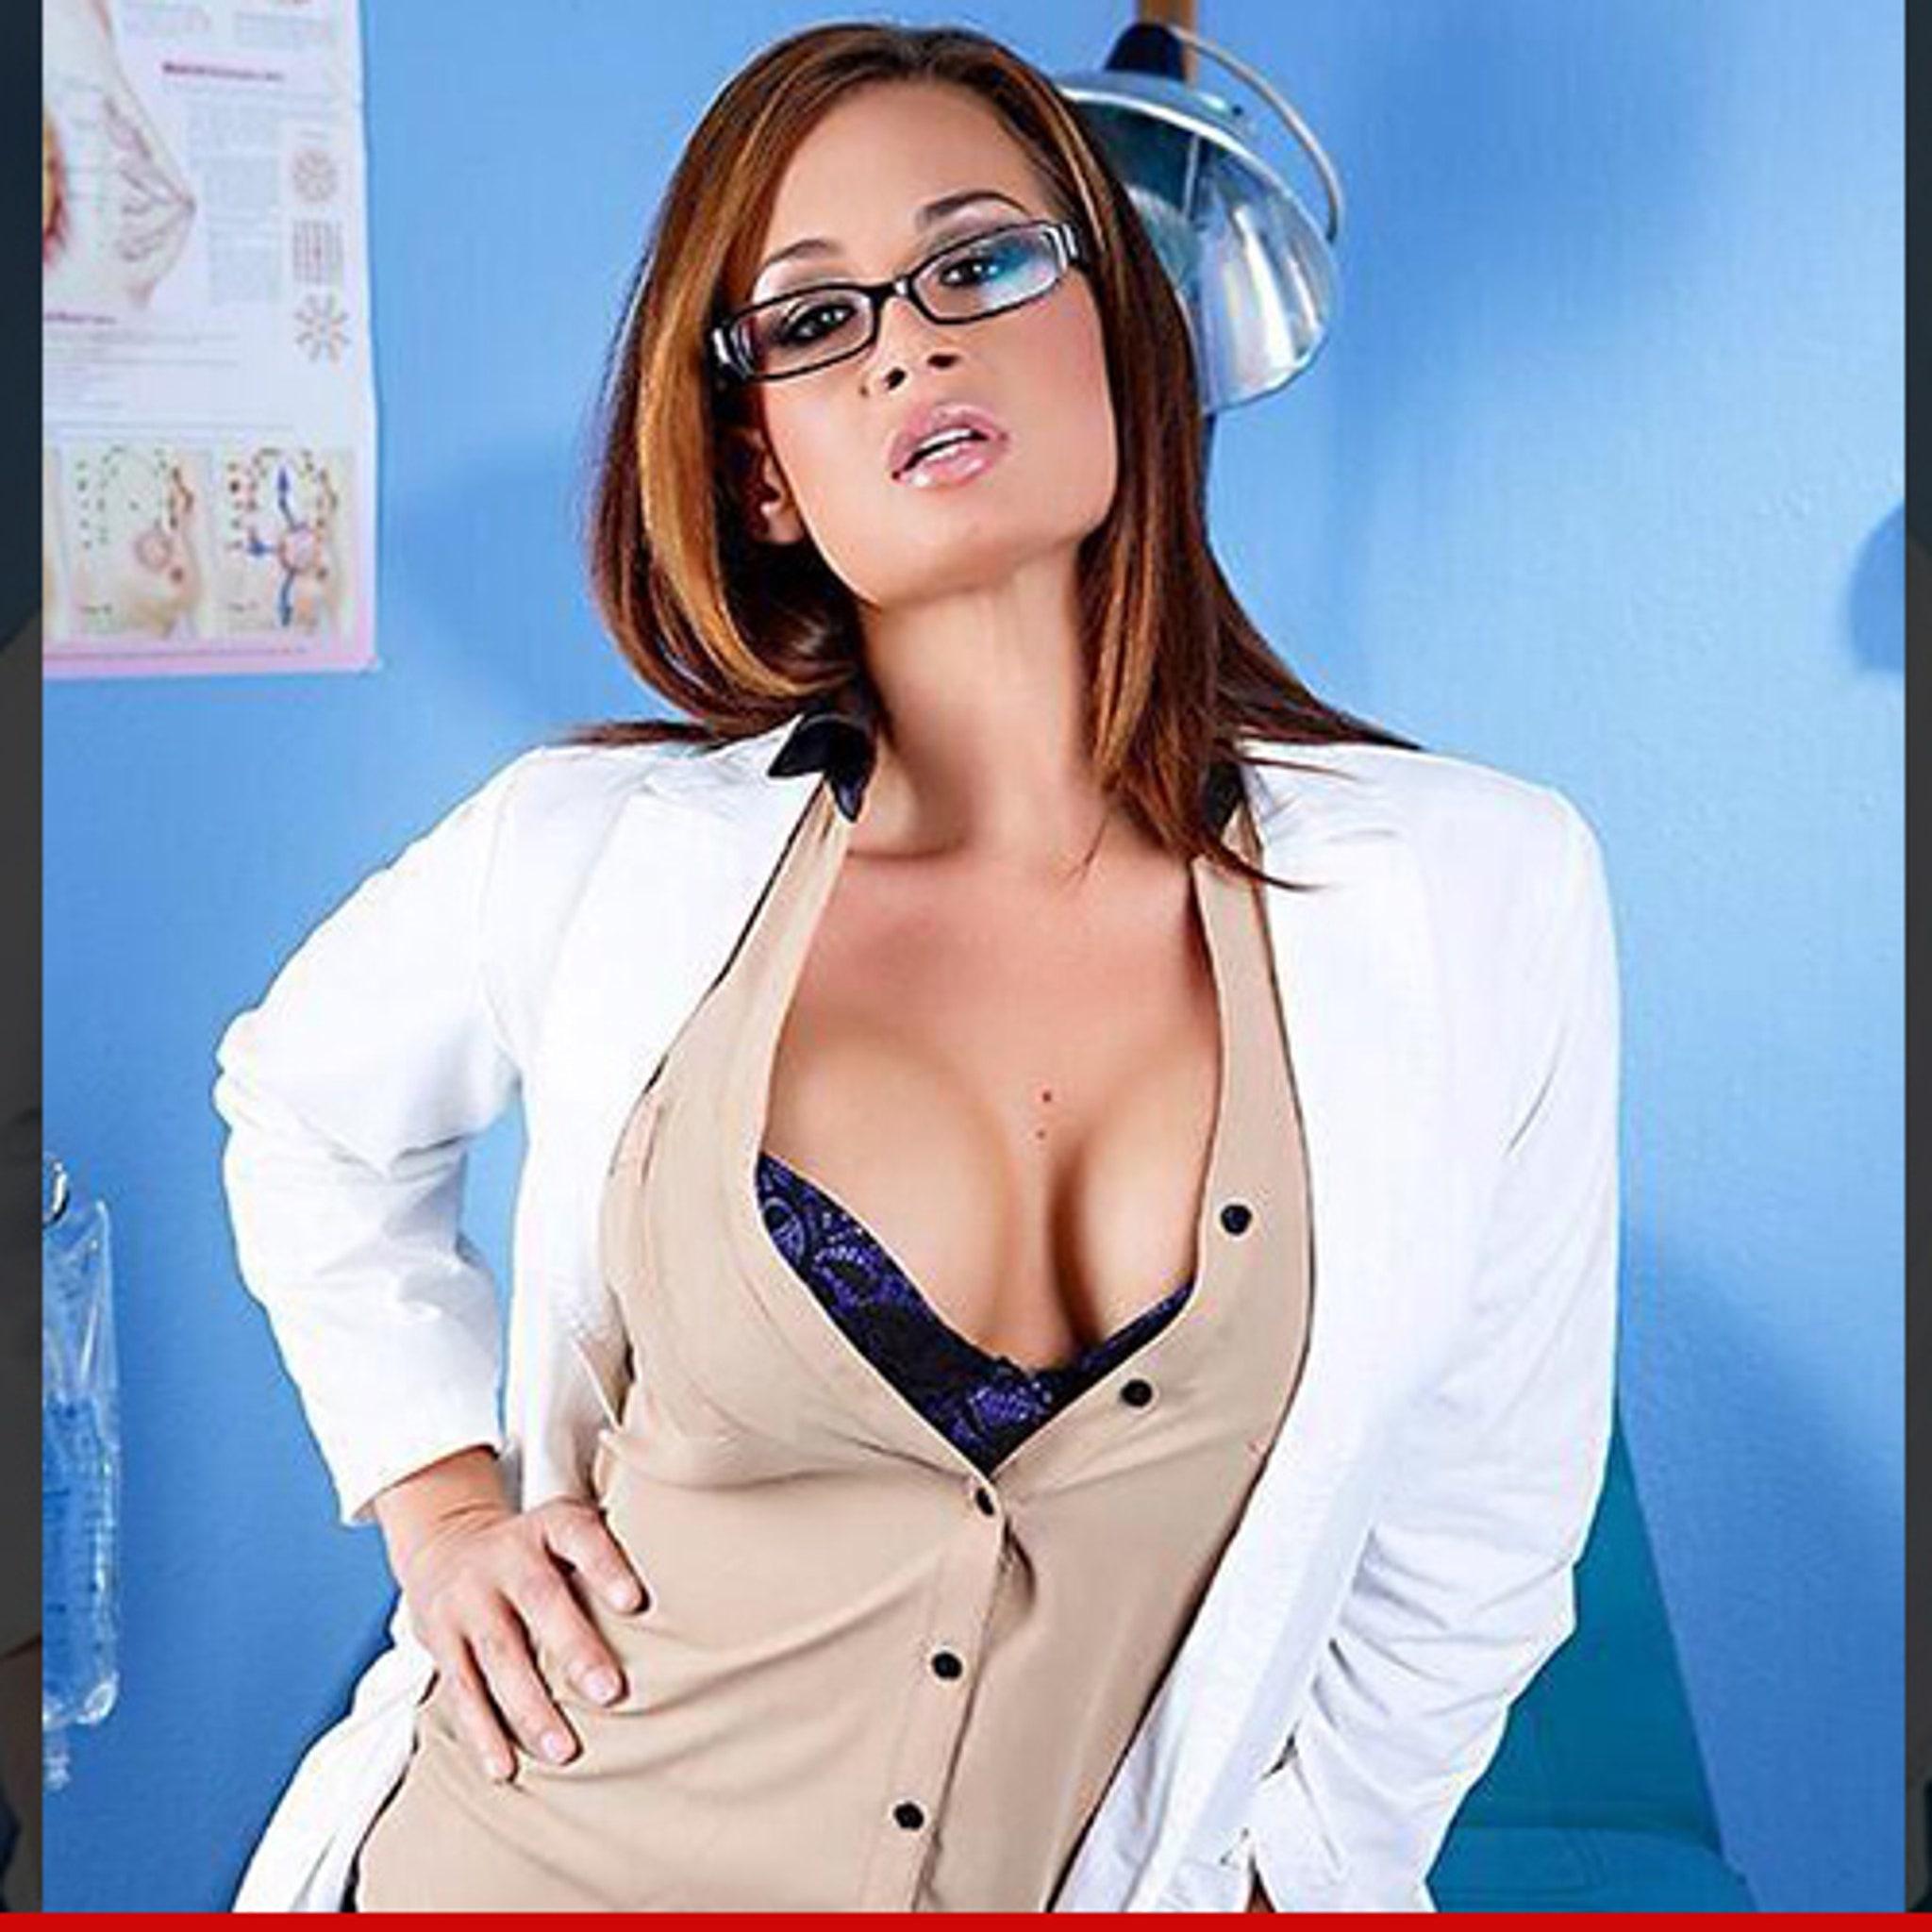 Porn star hot suck gallary photos